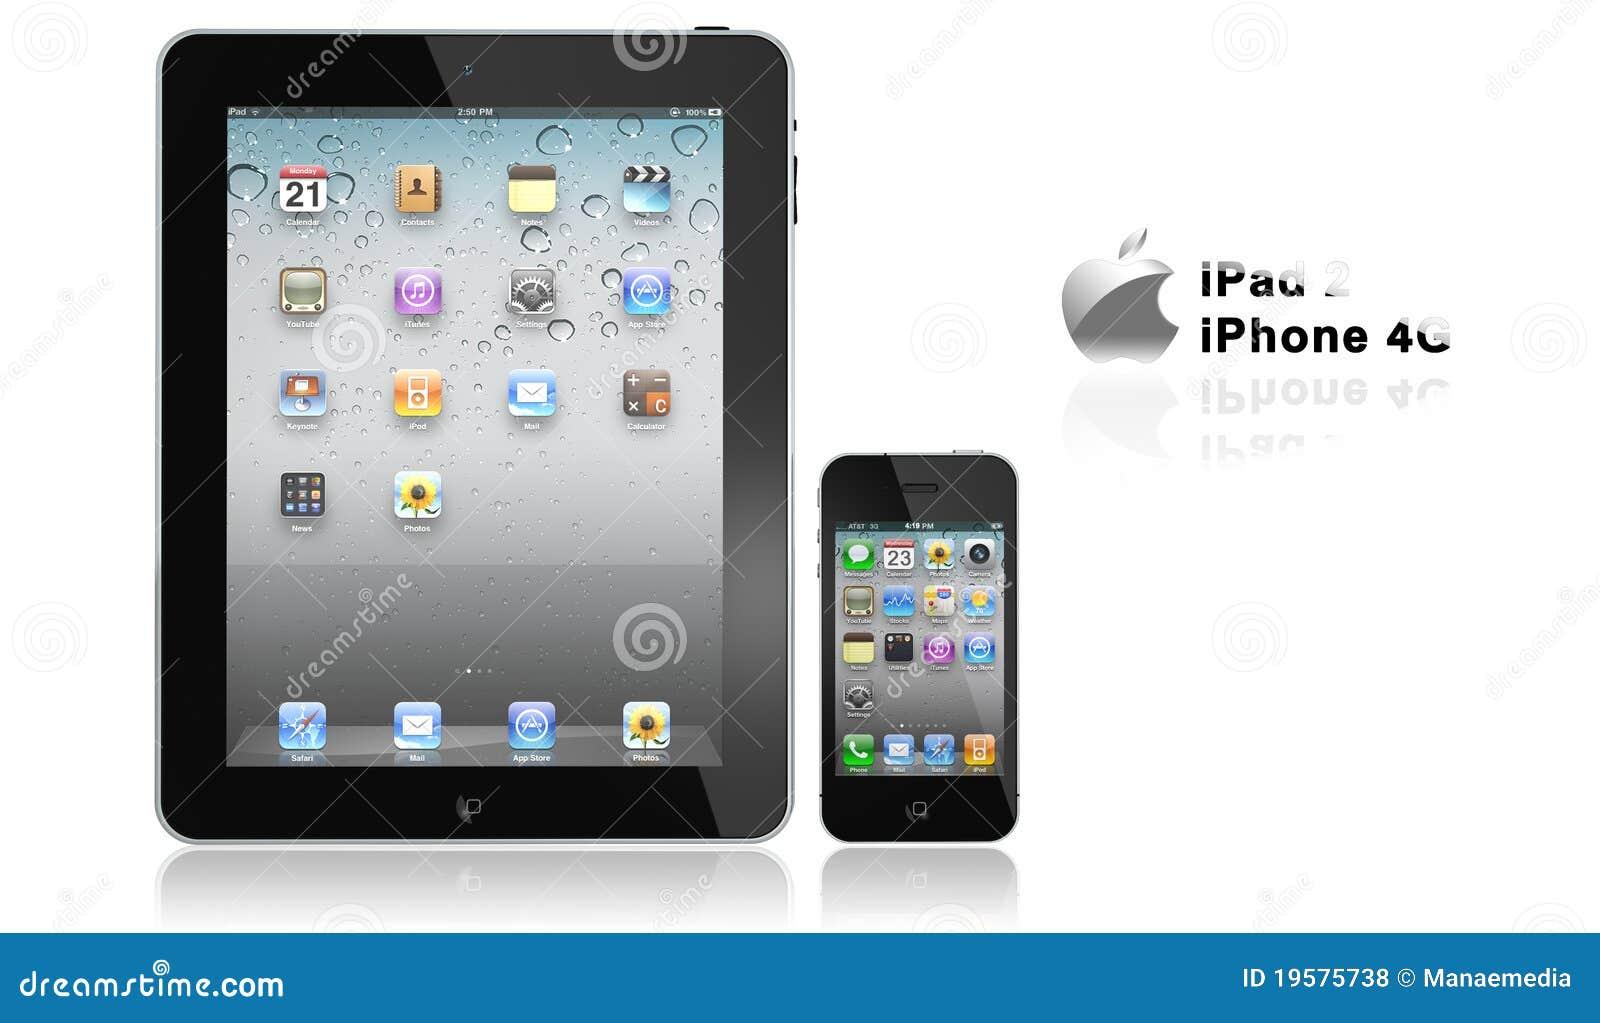 Apple iPad 2 and iPhone 4s